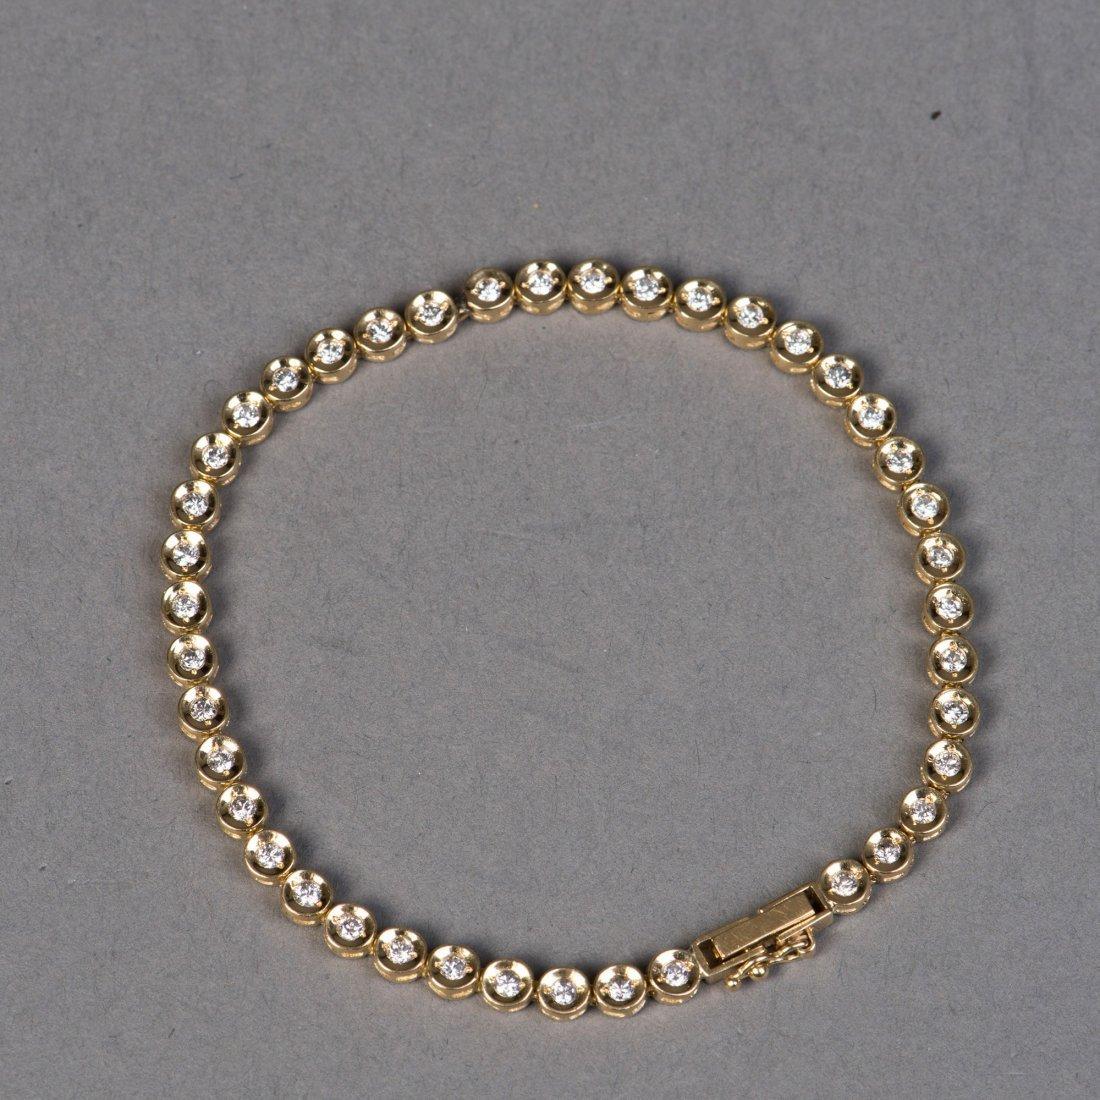 A GOLD BRACELET WITH DIAMOND SETTING